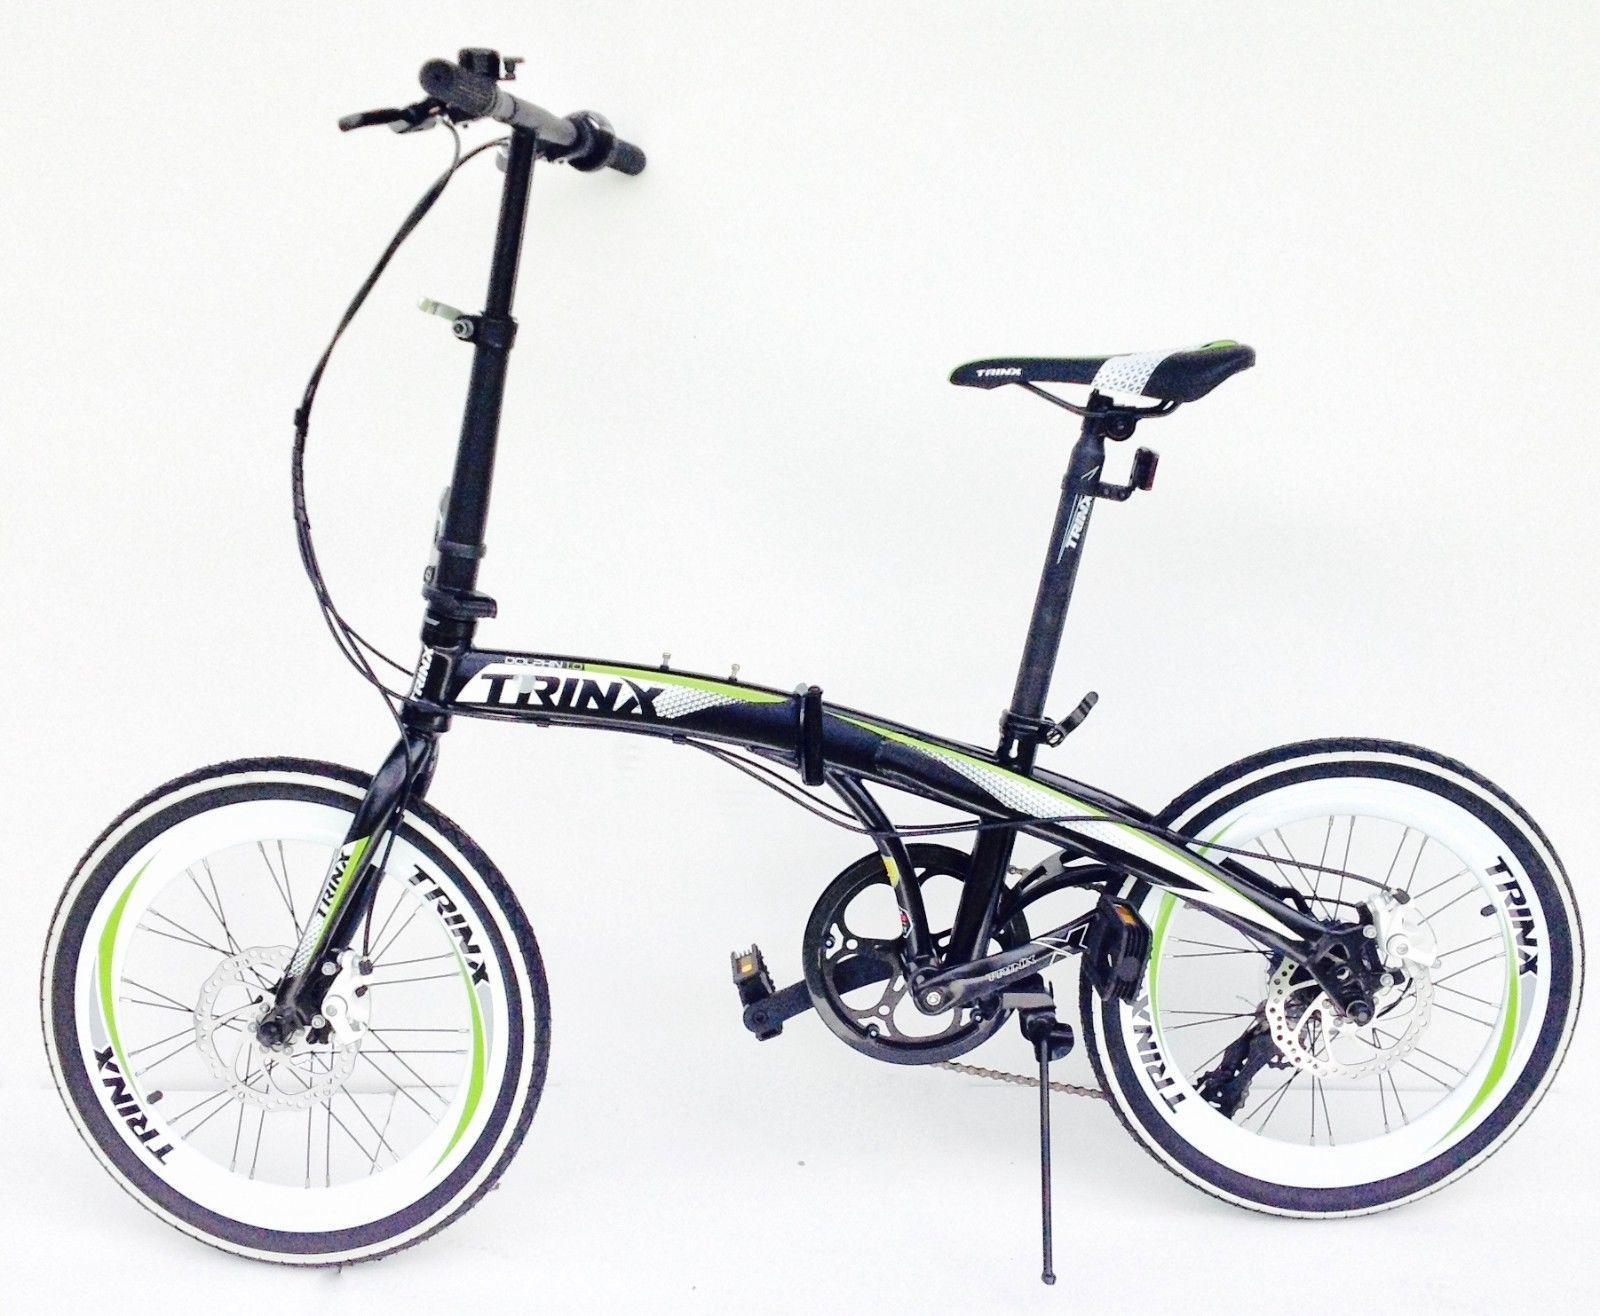 Details About Trinx Folding Bike 20 Inch Wheels 7 Speed Shimano